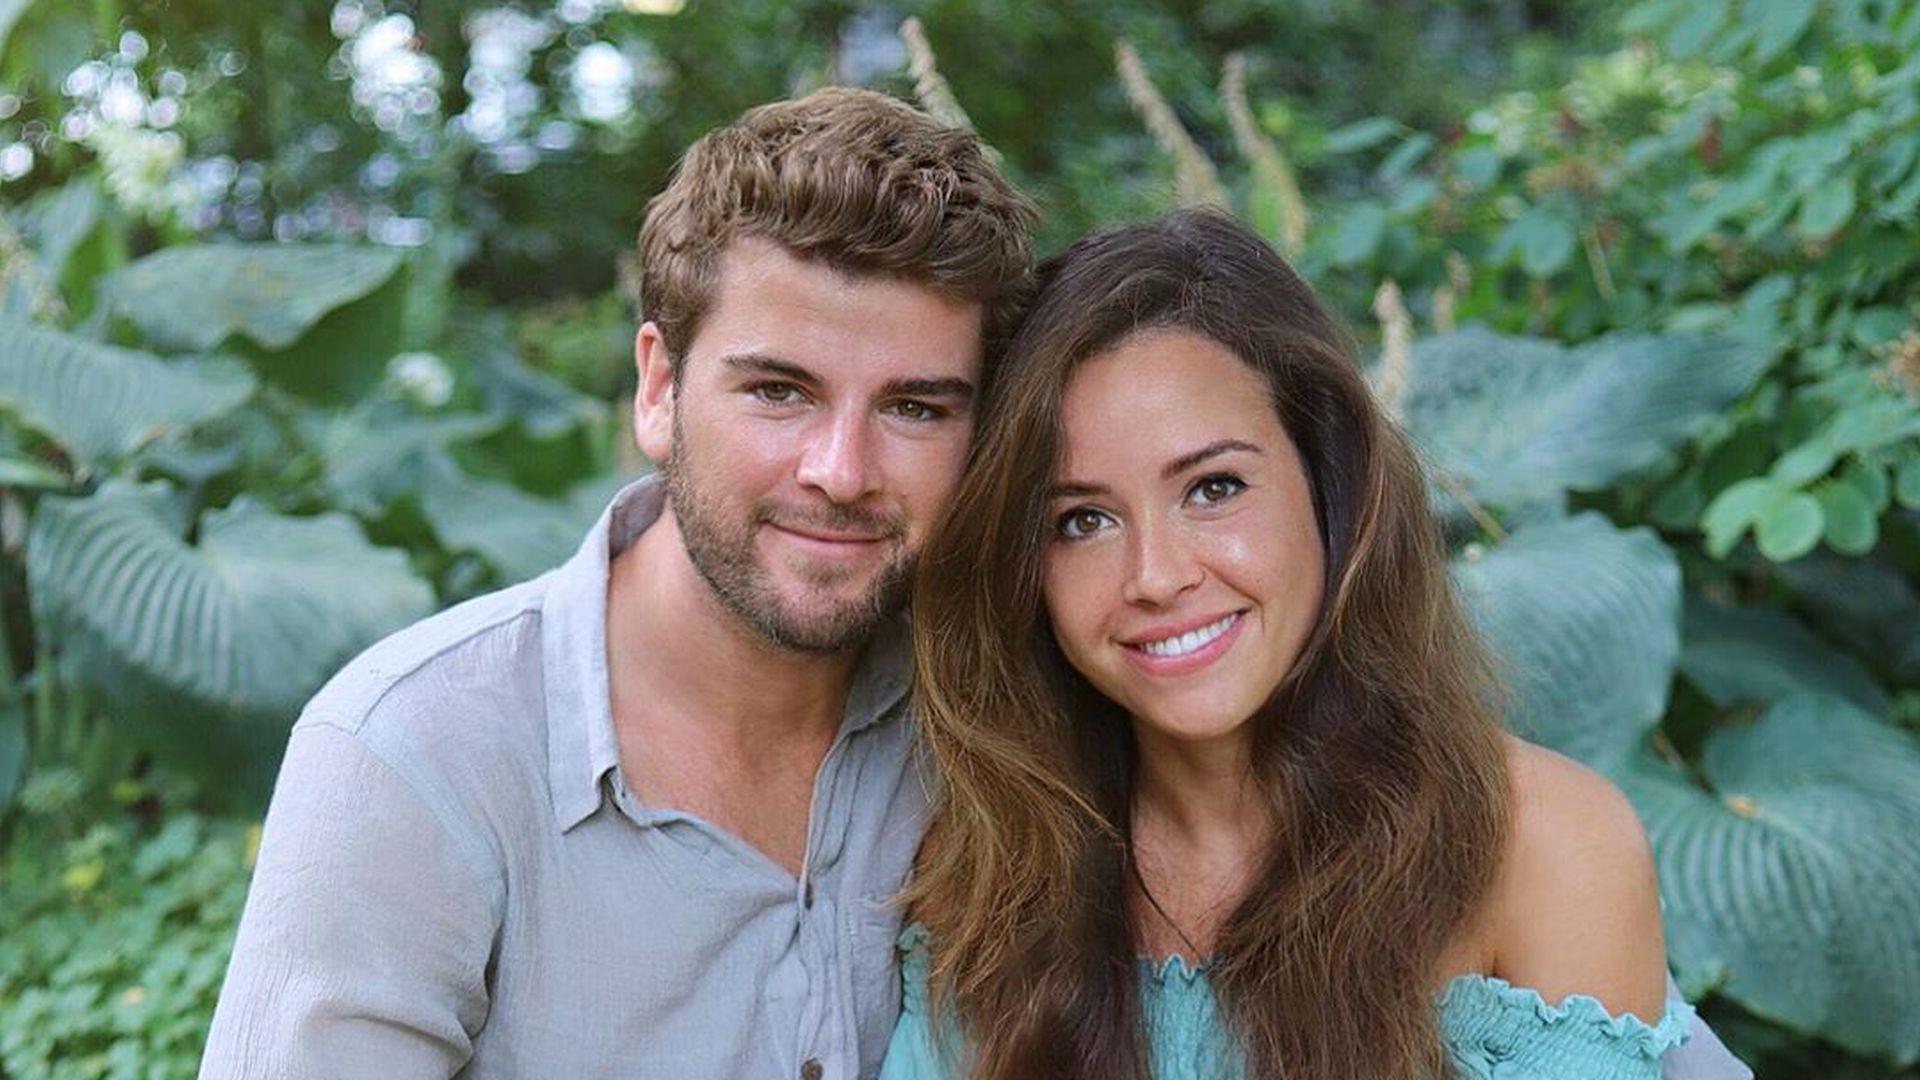 Liebe fand Glück: Ex-Bachelorette Alisa ist verlobt